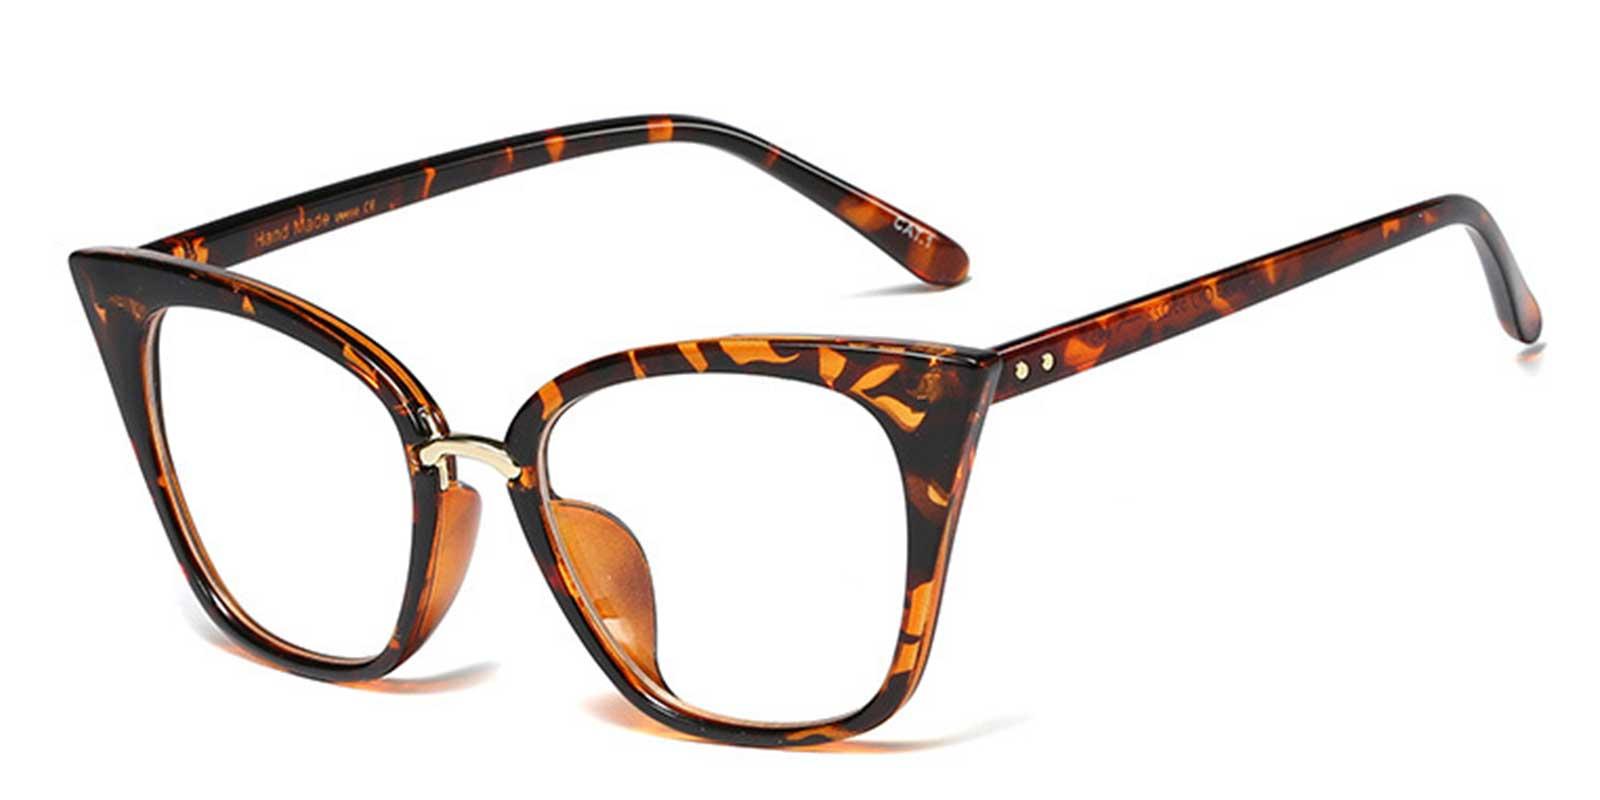 Delicia-Cat eye glasses: the elegant  frame designed